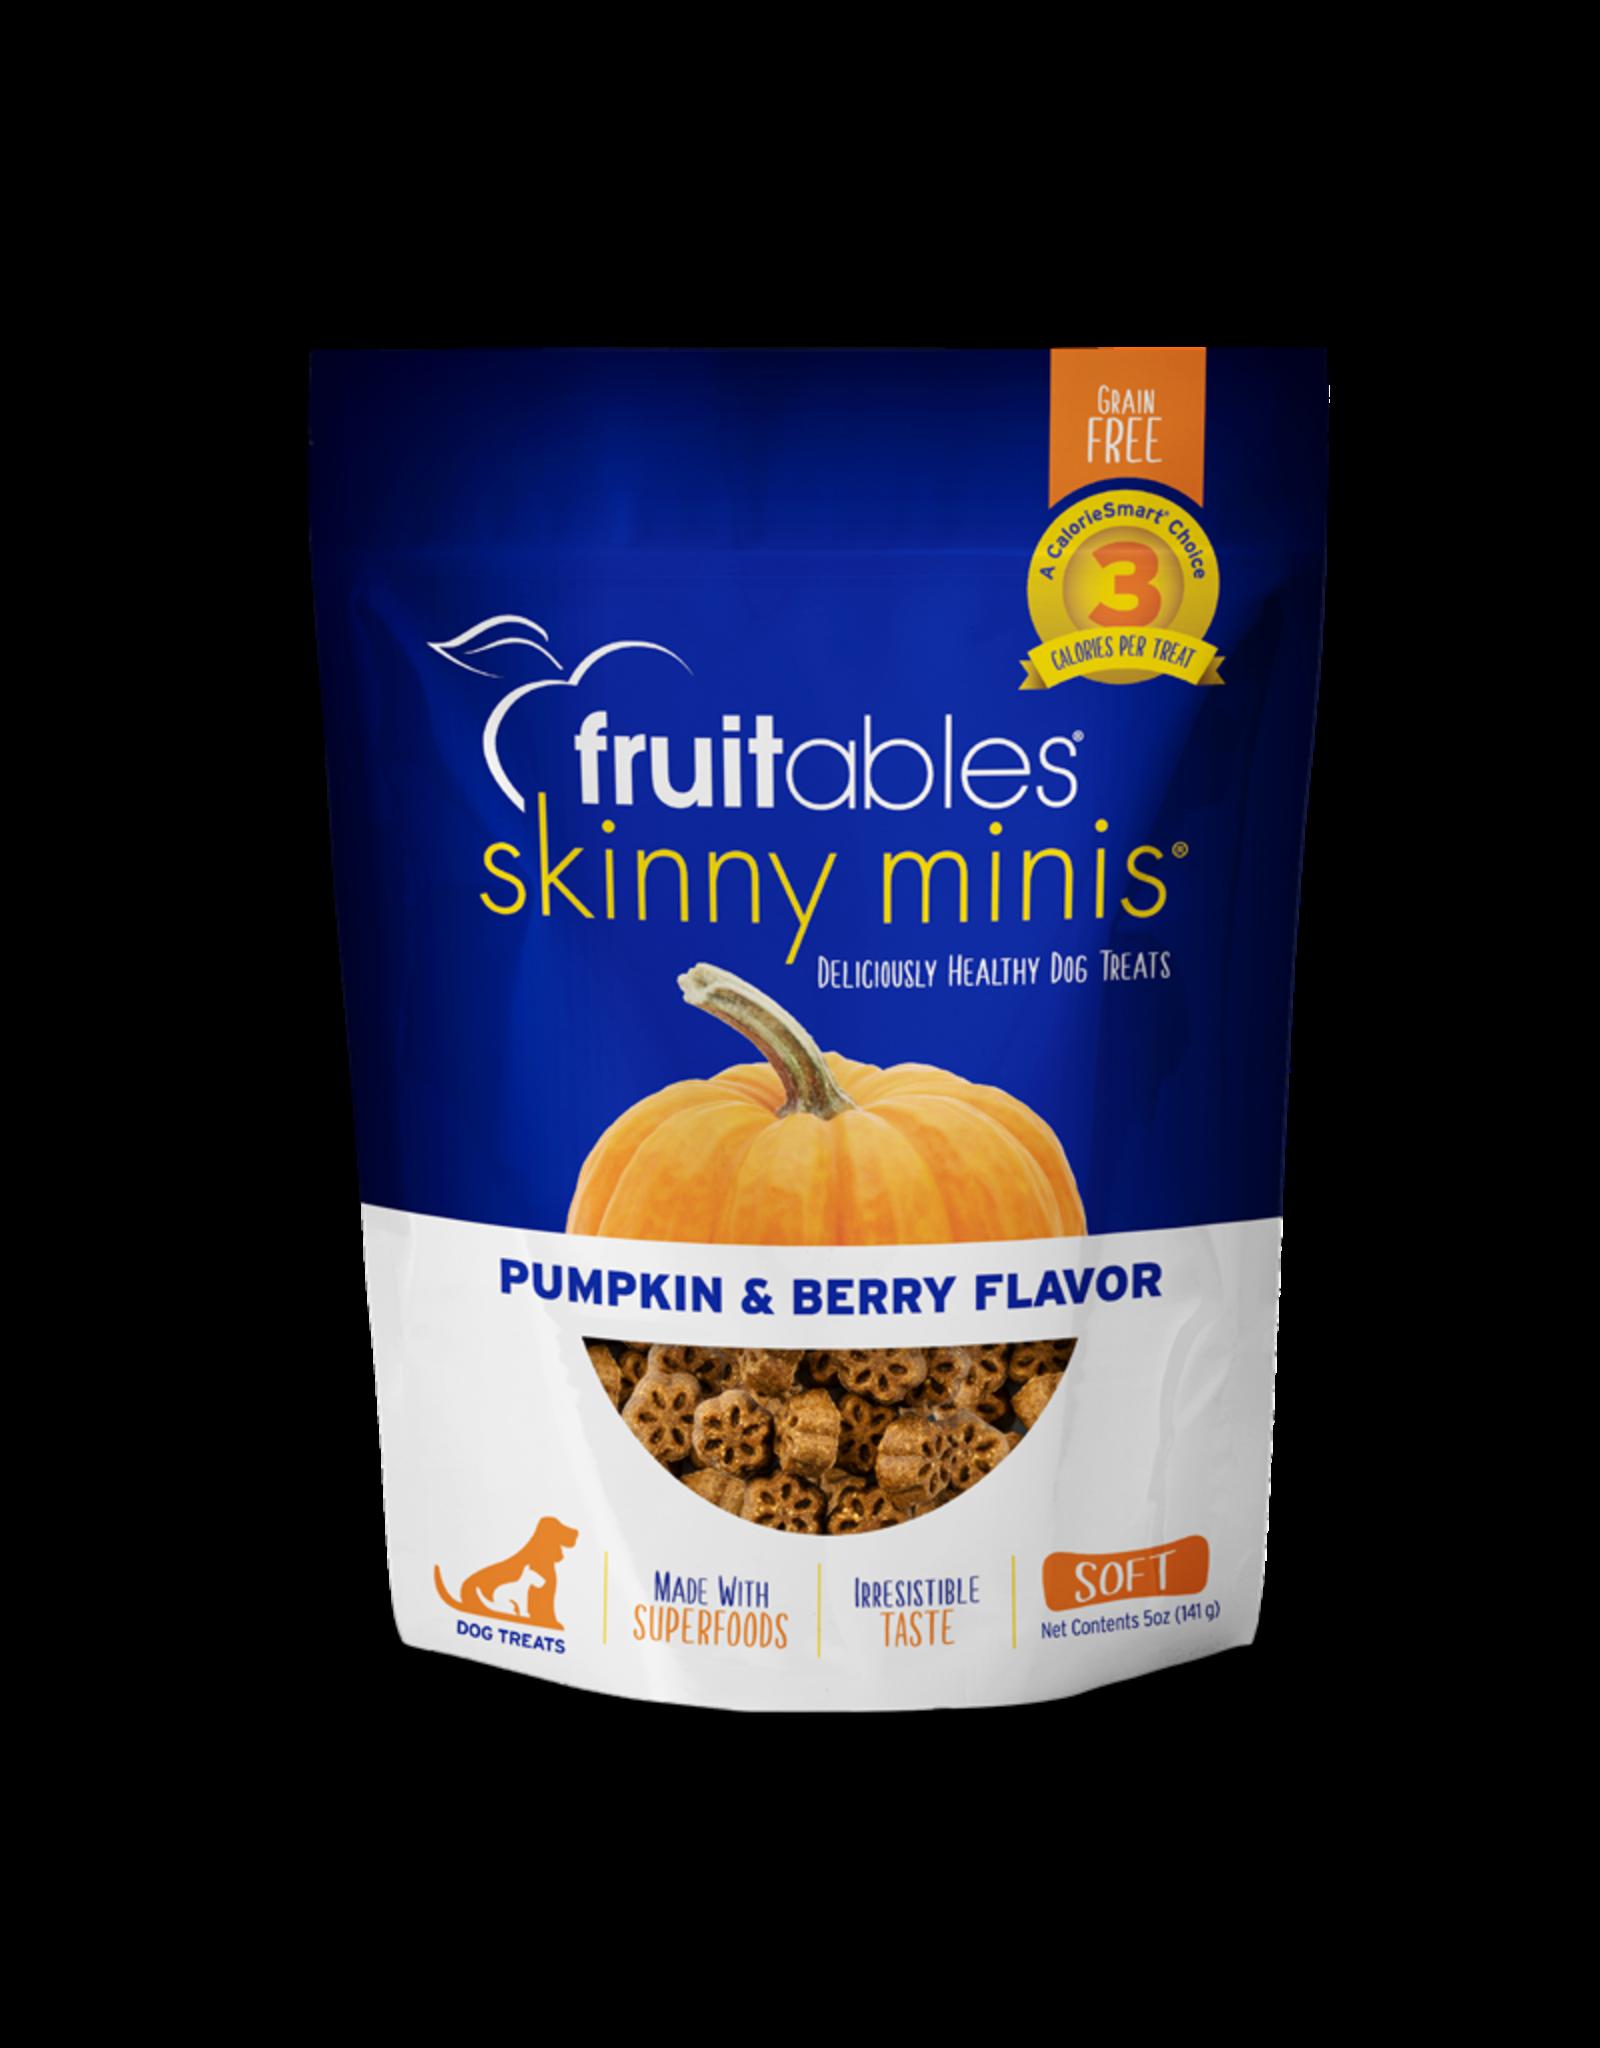 Fruitables Fruitables Skinny Mini's Pumpkin & Berry 5oz